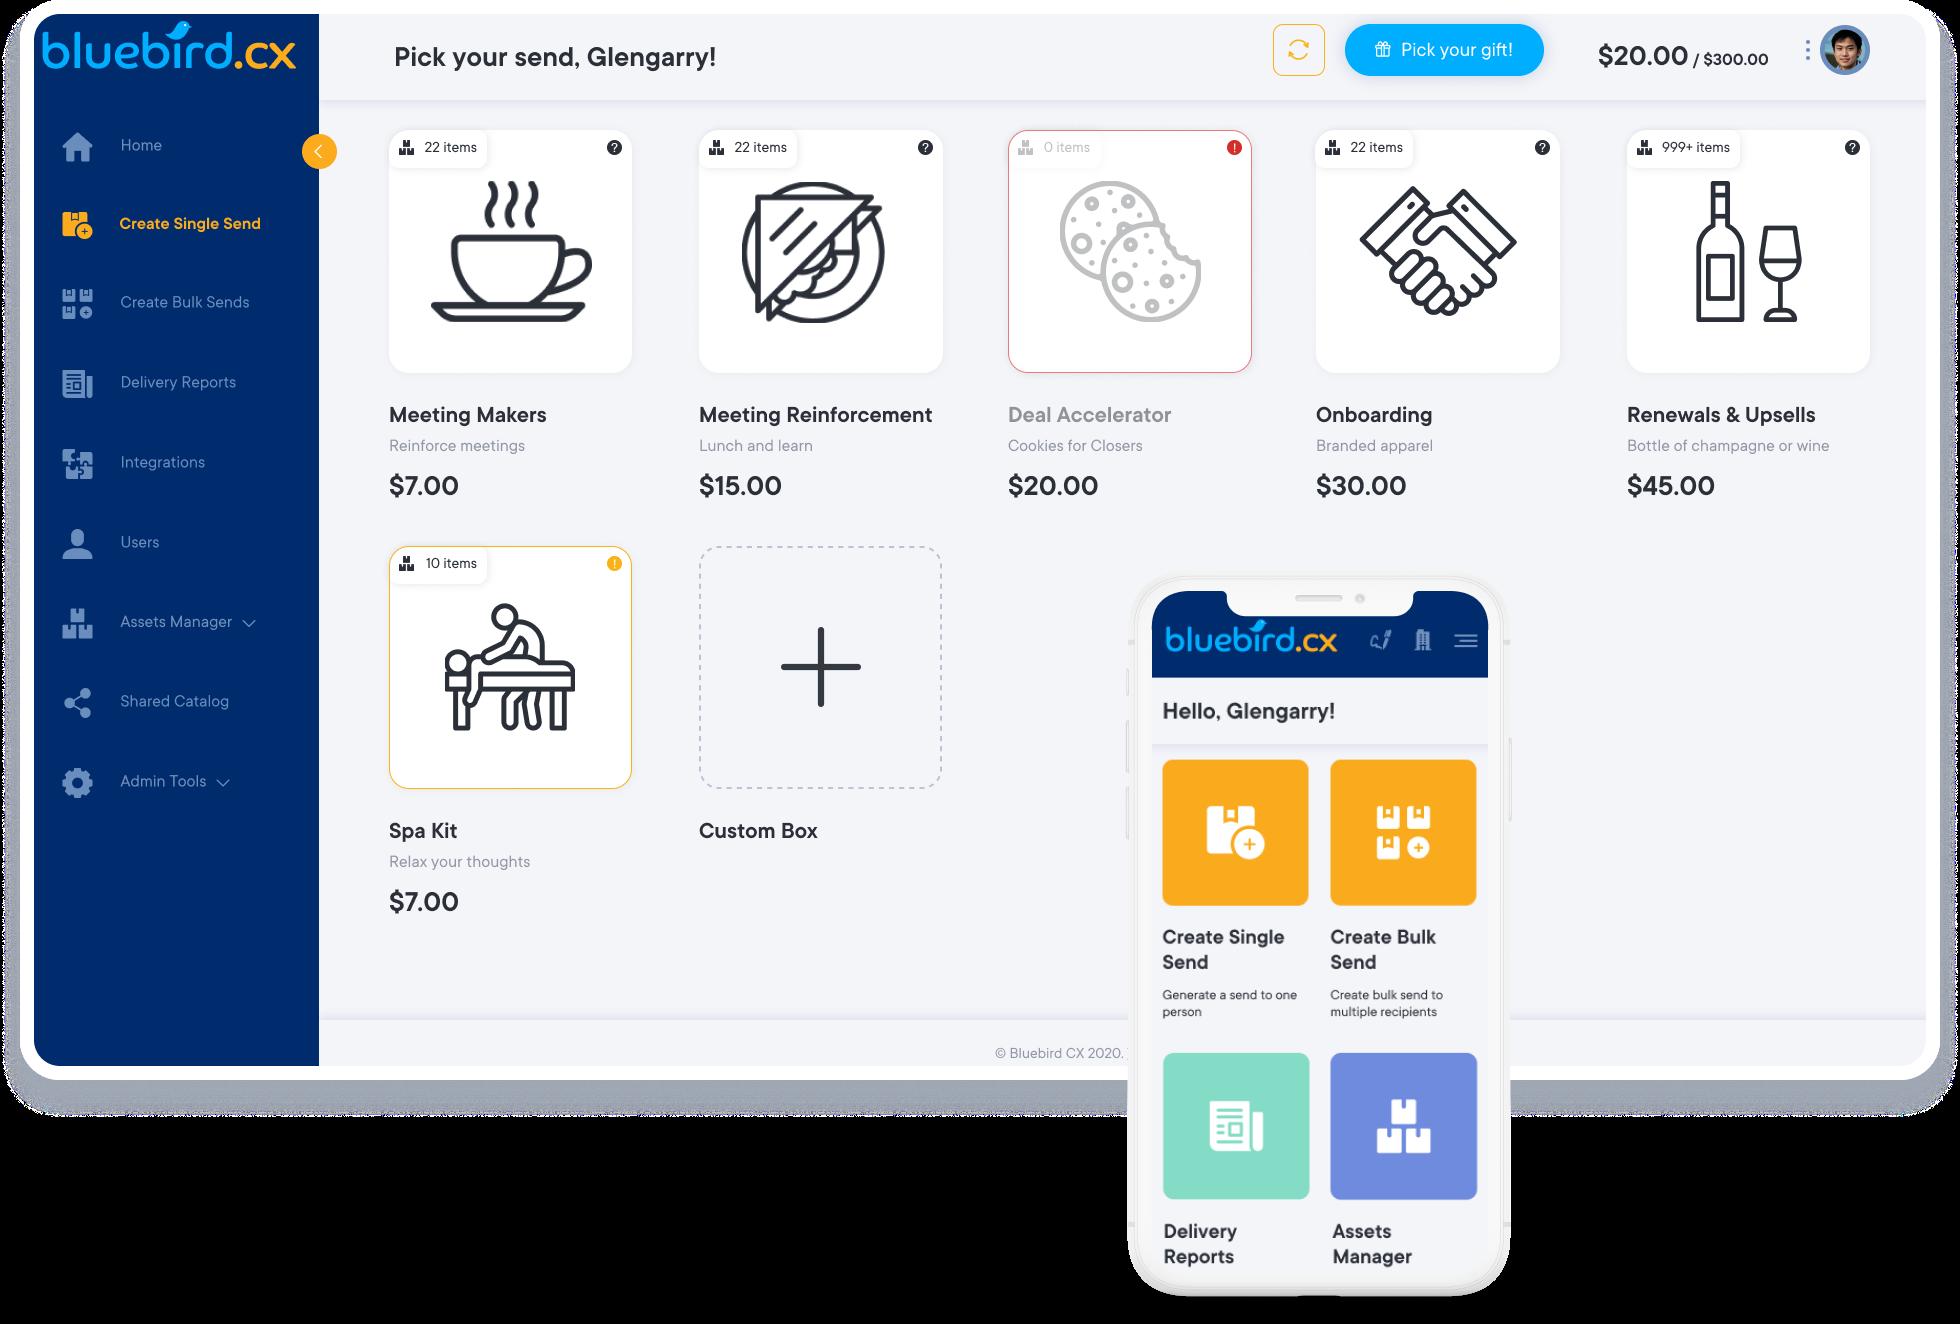 corporate gifting platform